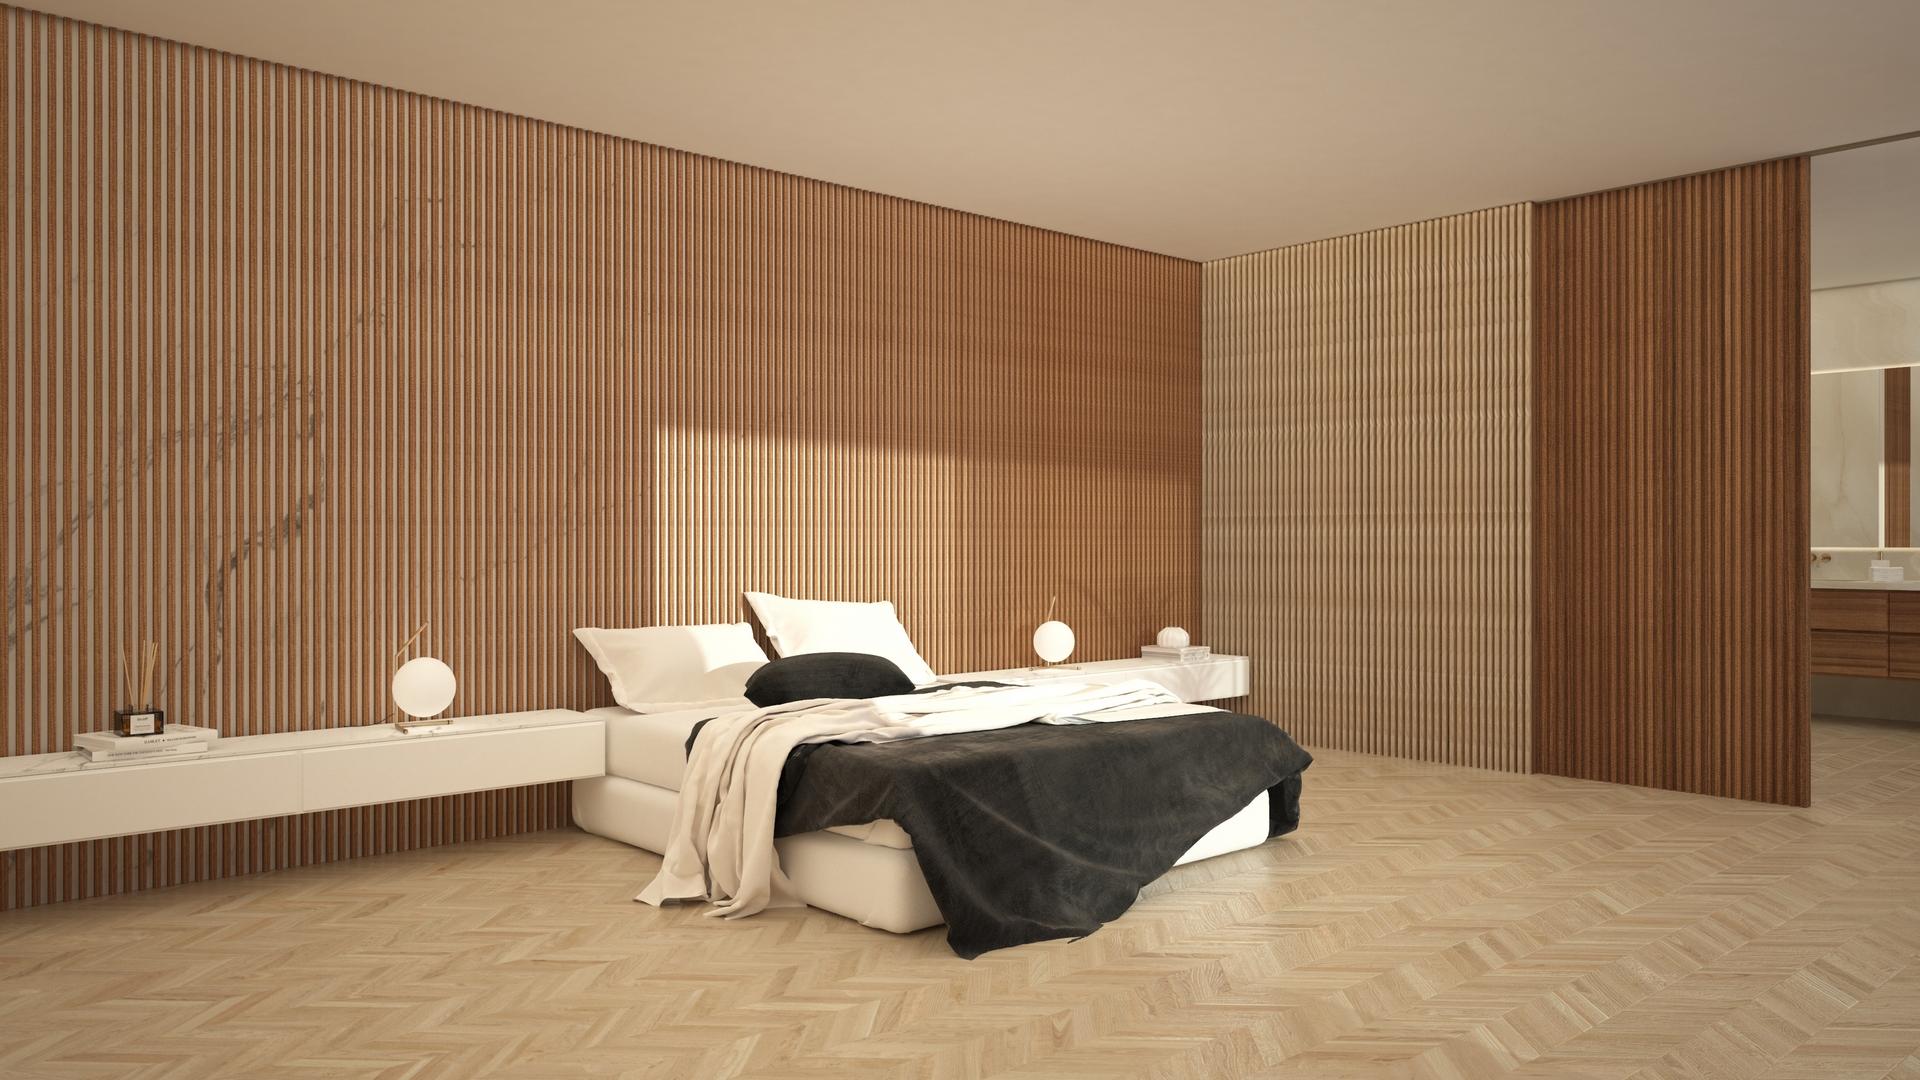 Penthouse - bedroom 1 (Αντιγραφή)